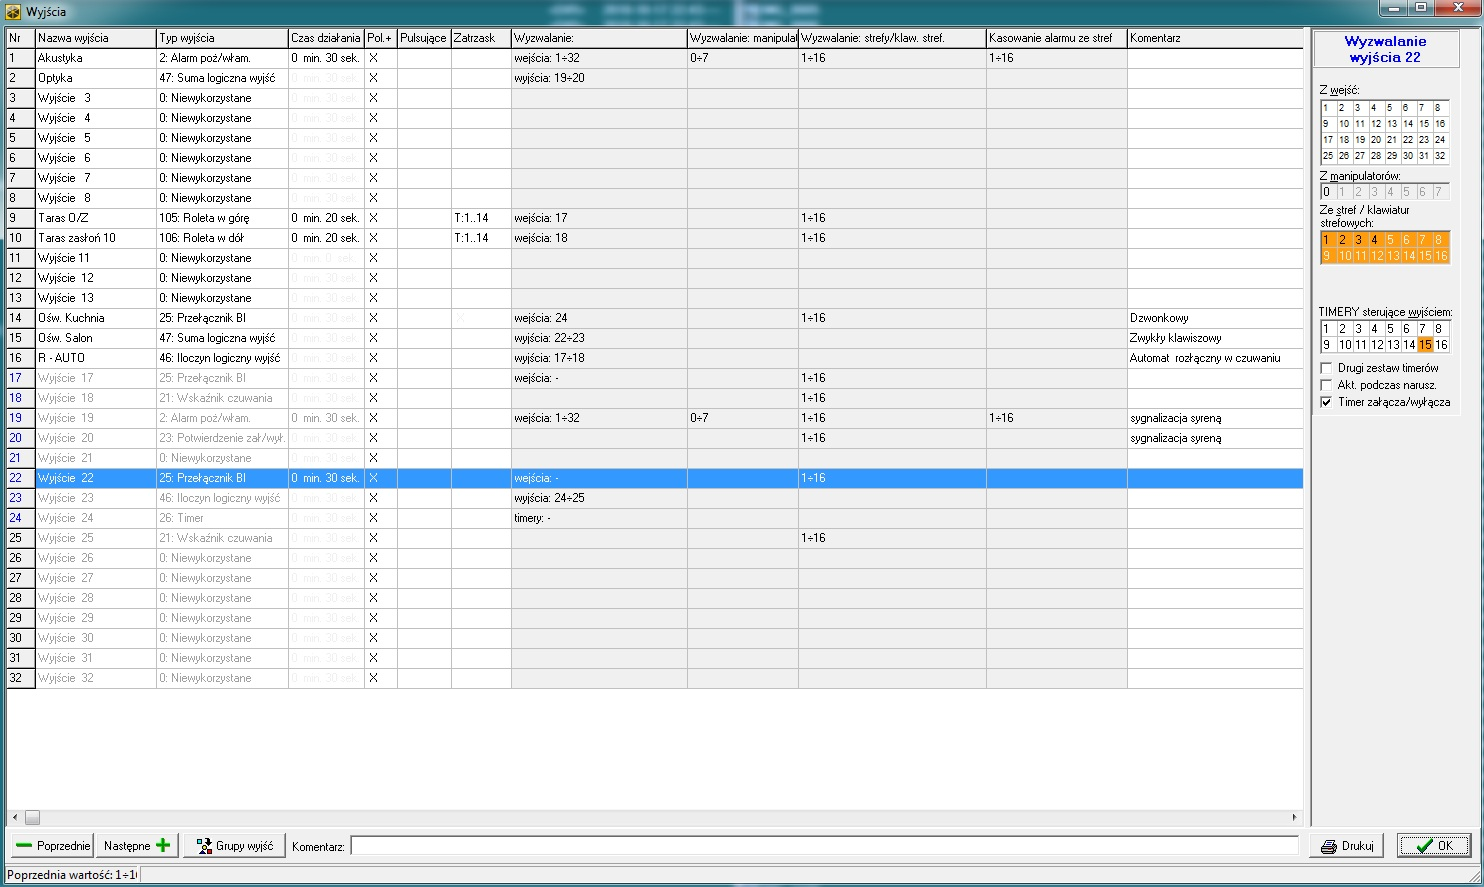 Integra 32 - symulacja obecno�ci domownika